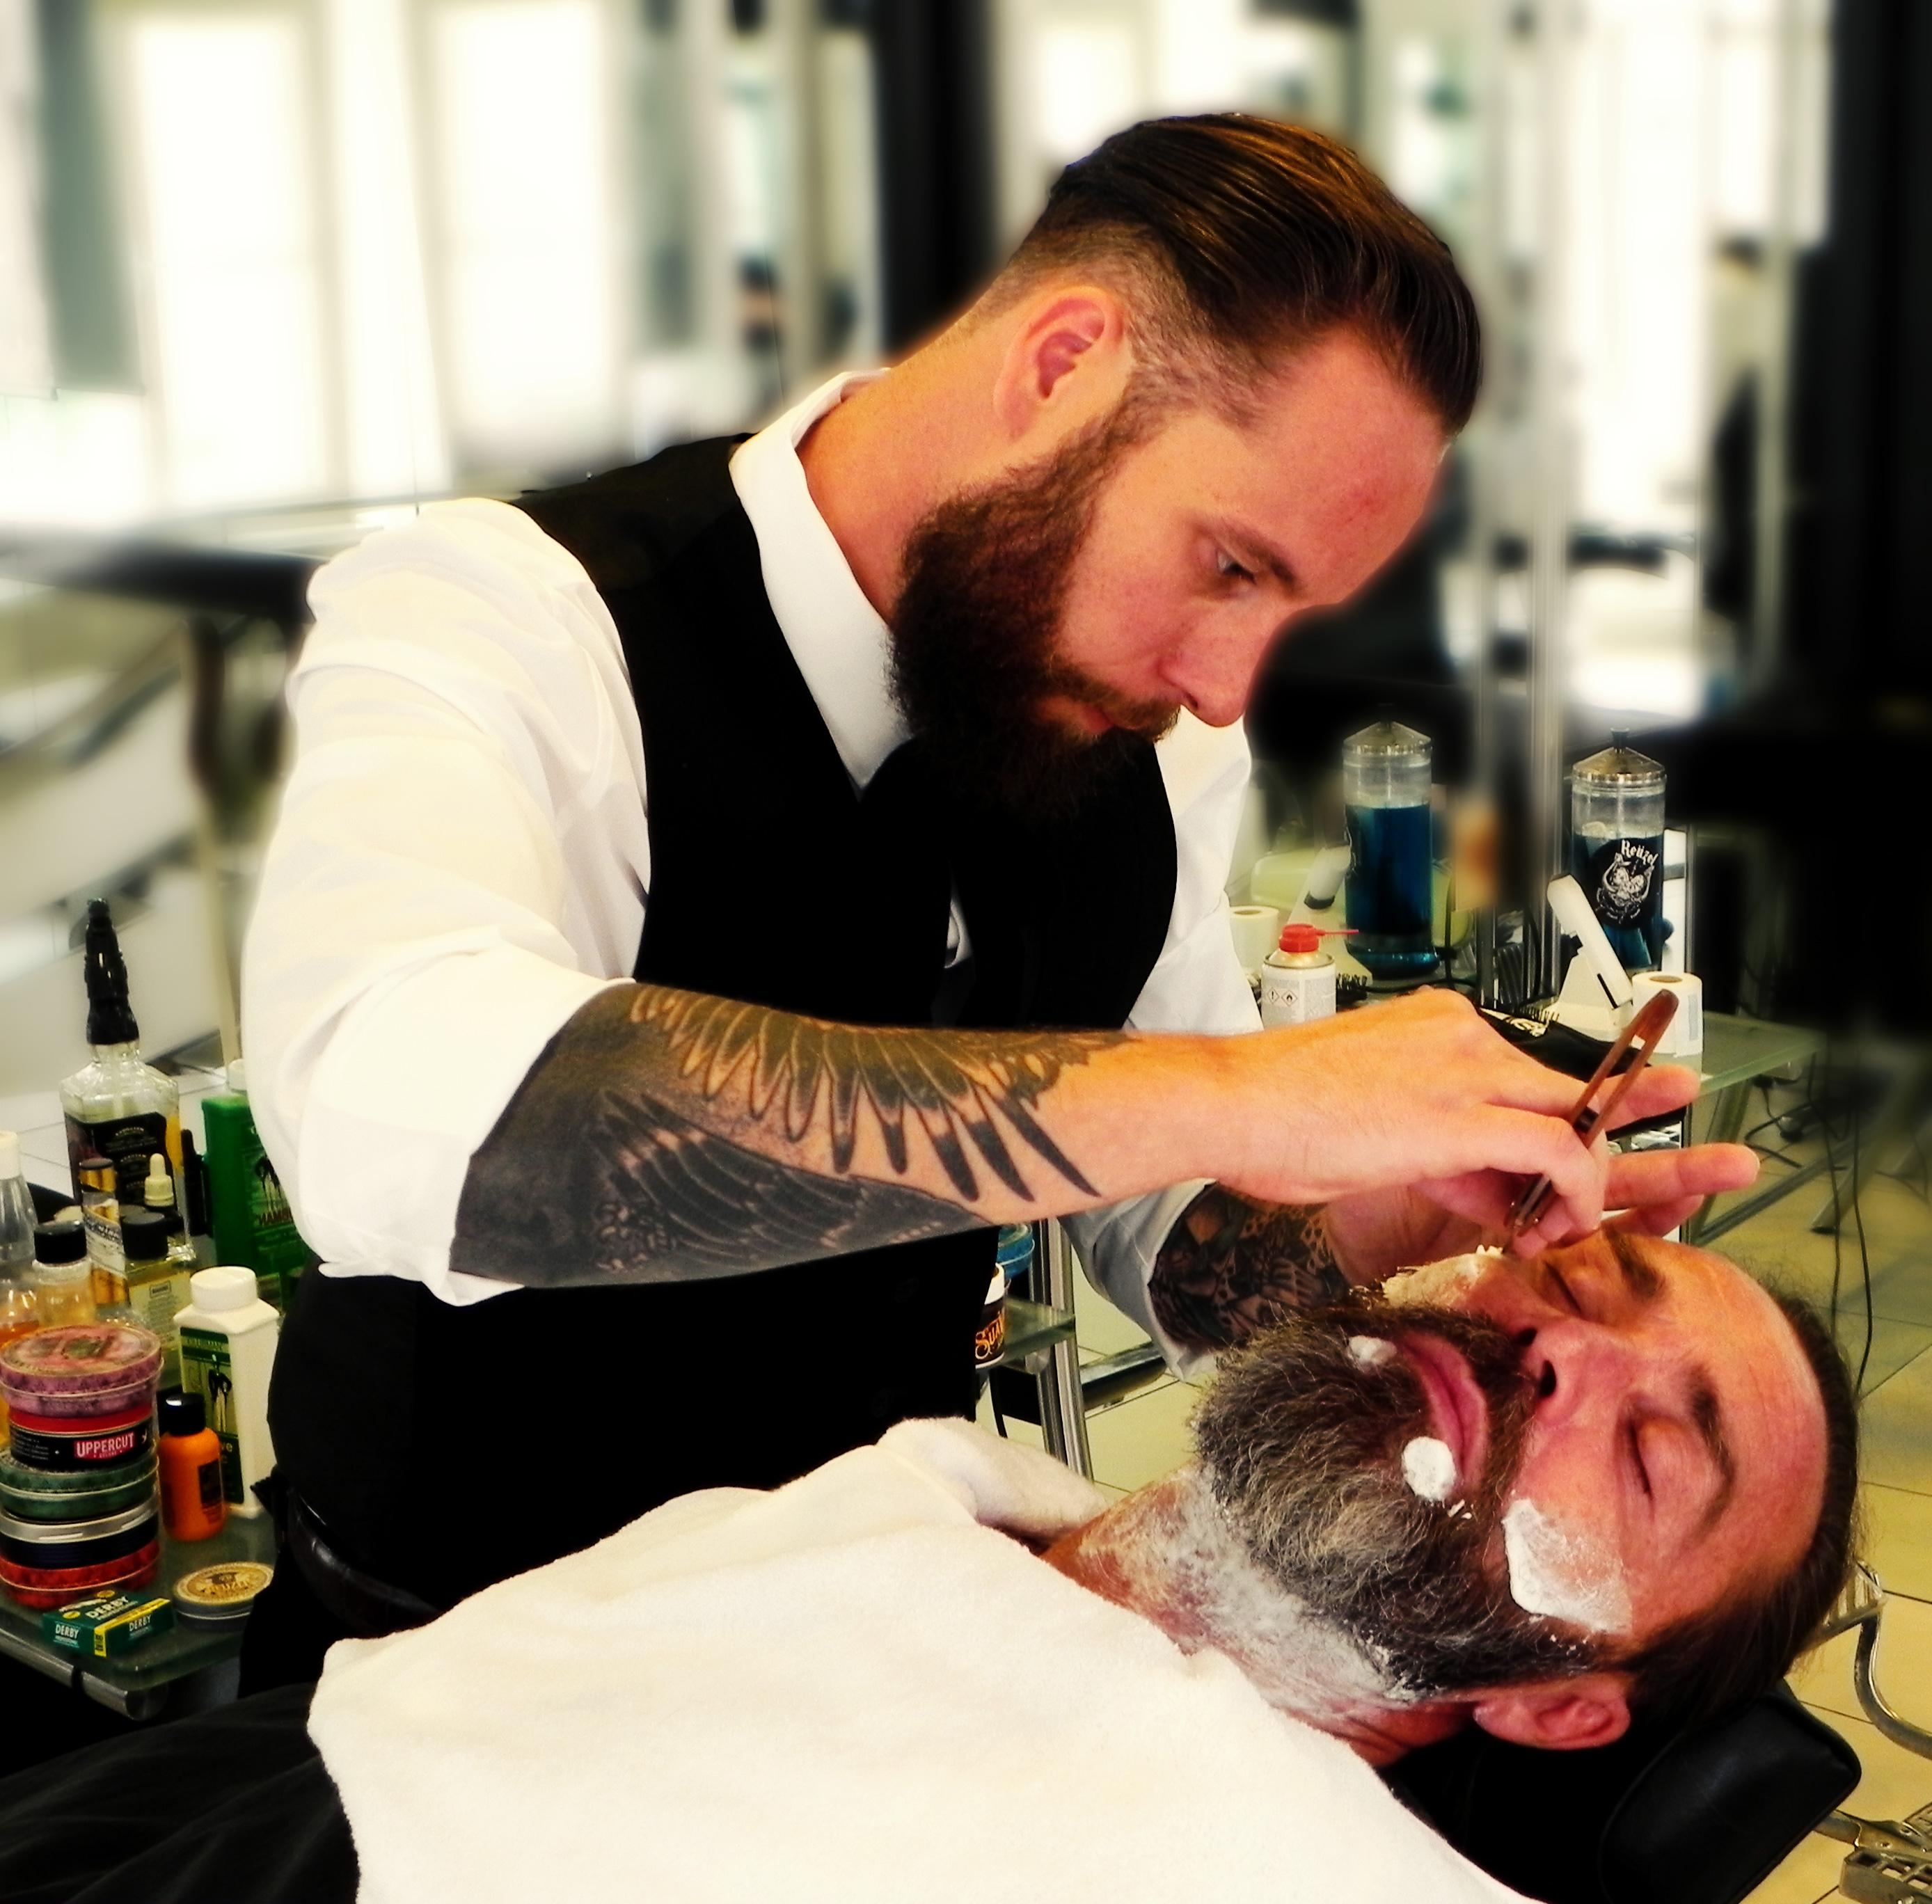 Duke Johns Barbershop beim rasieren